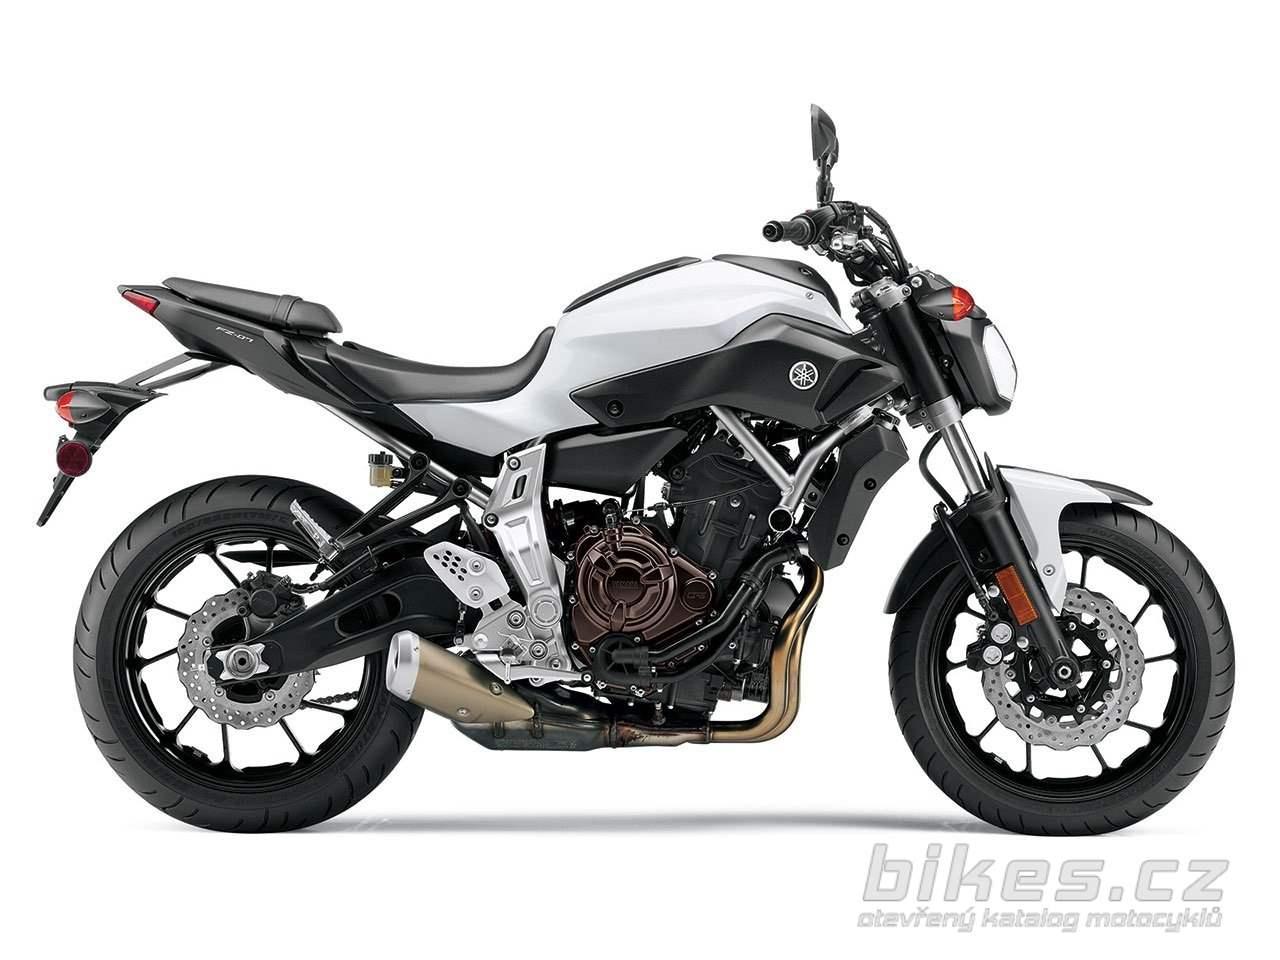 2015 Yamaha Fz-07 clean title 2200 miles - Bikes for sale